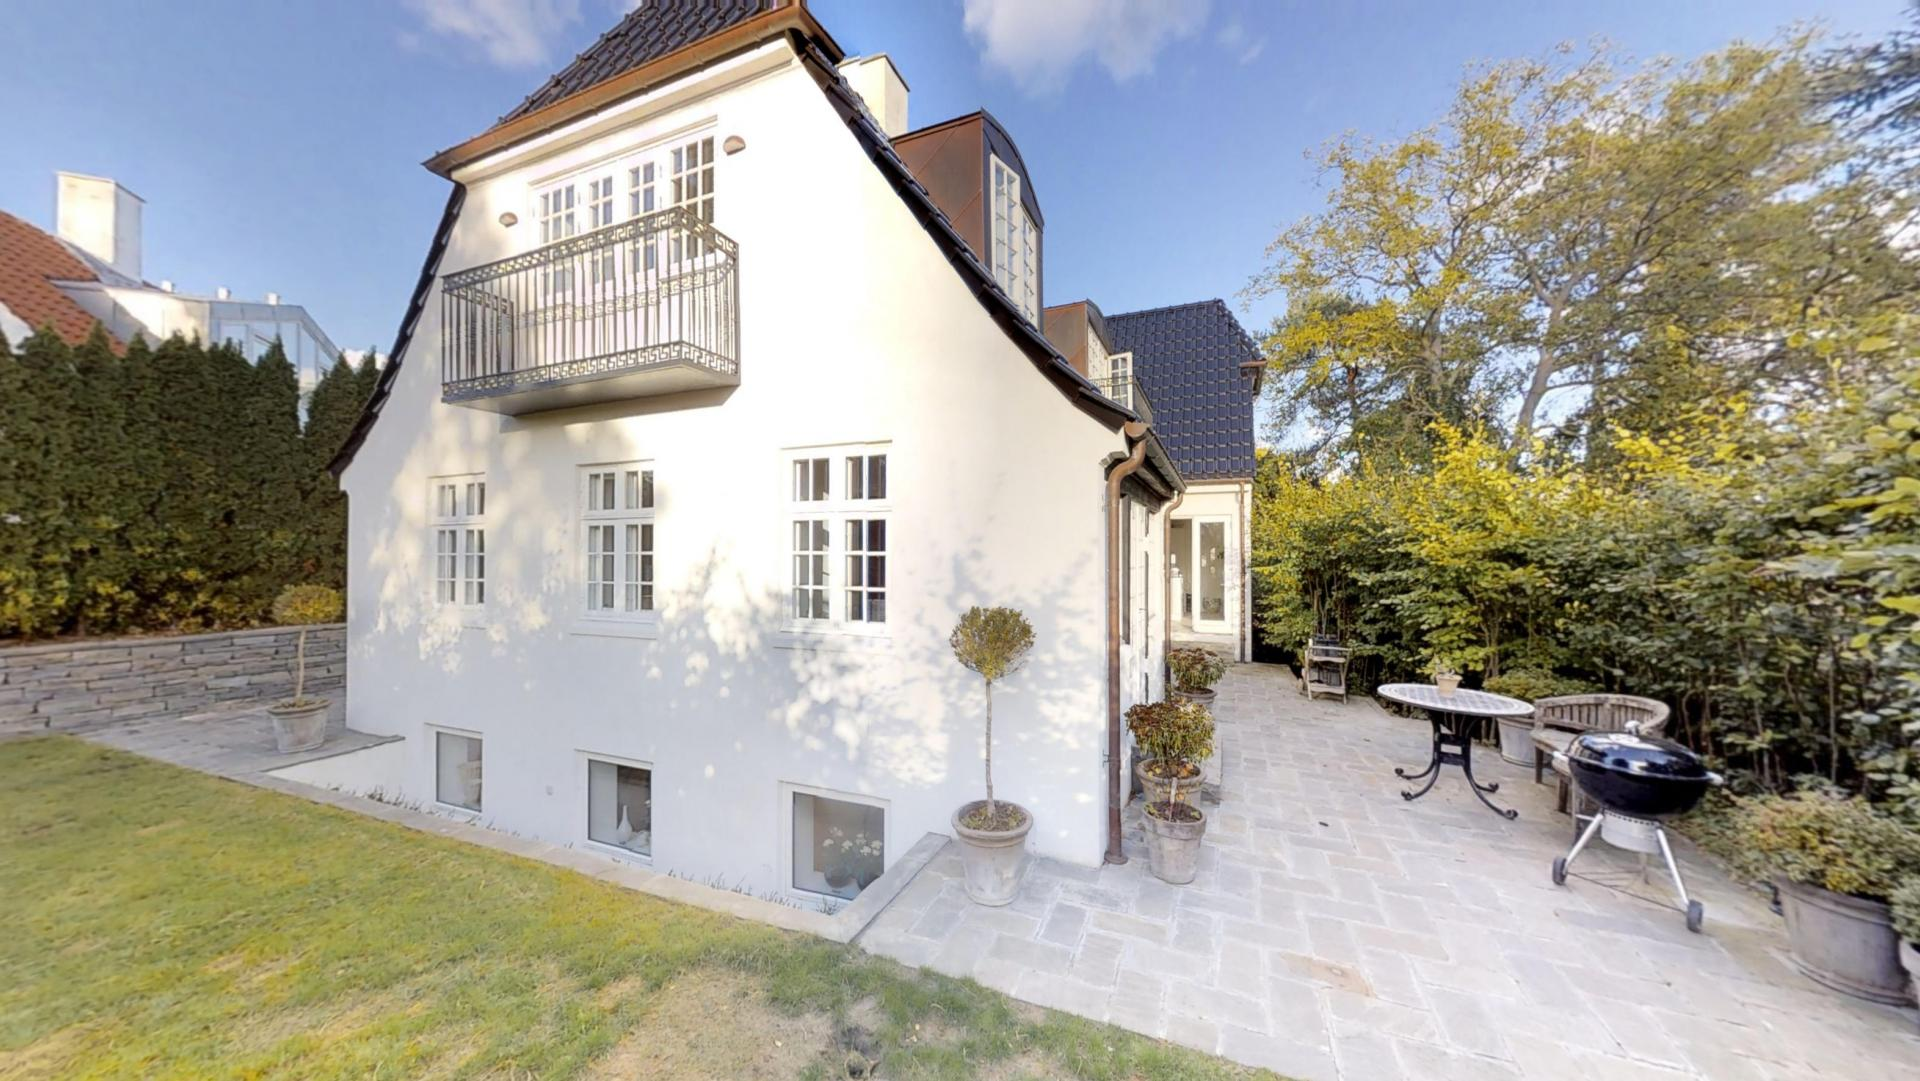 225 m² villa (300 etage m²)   Klampenborg   Housing Denmark